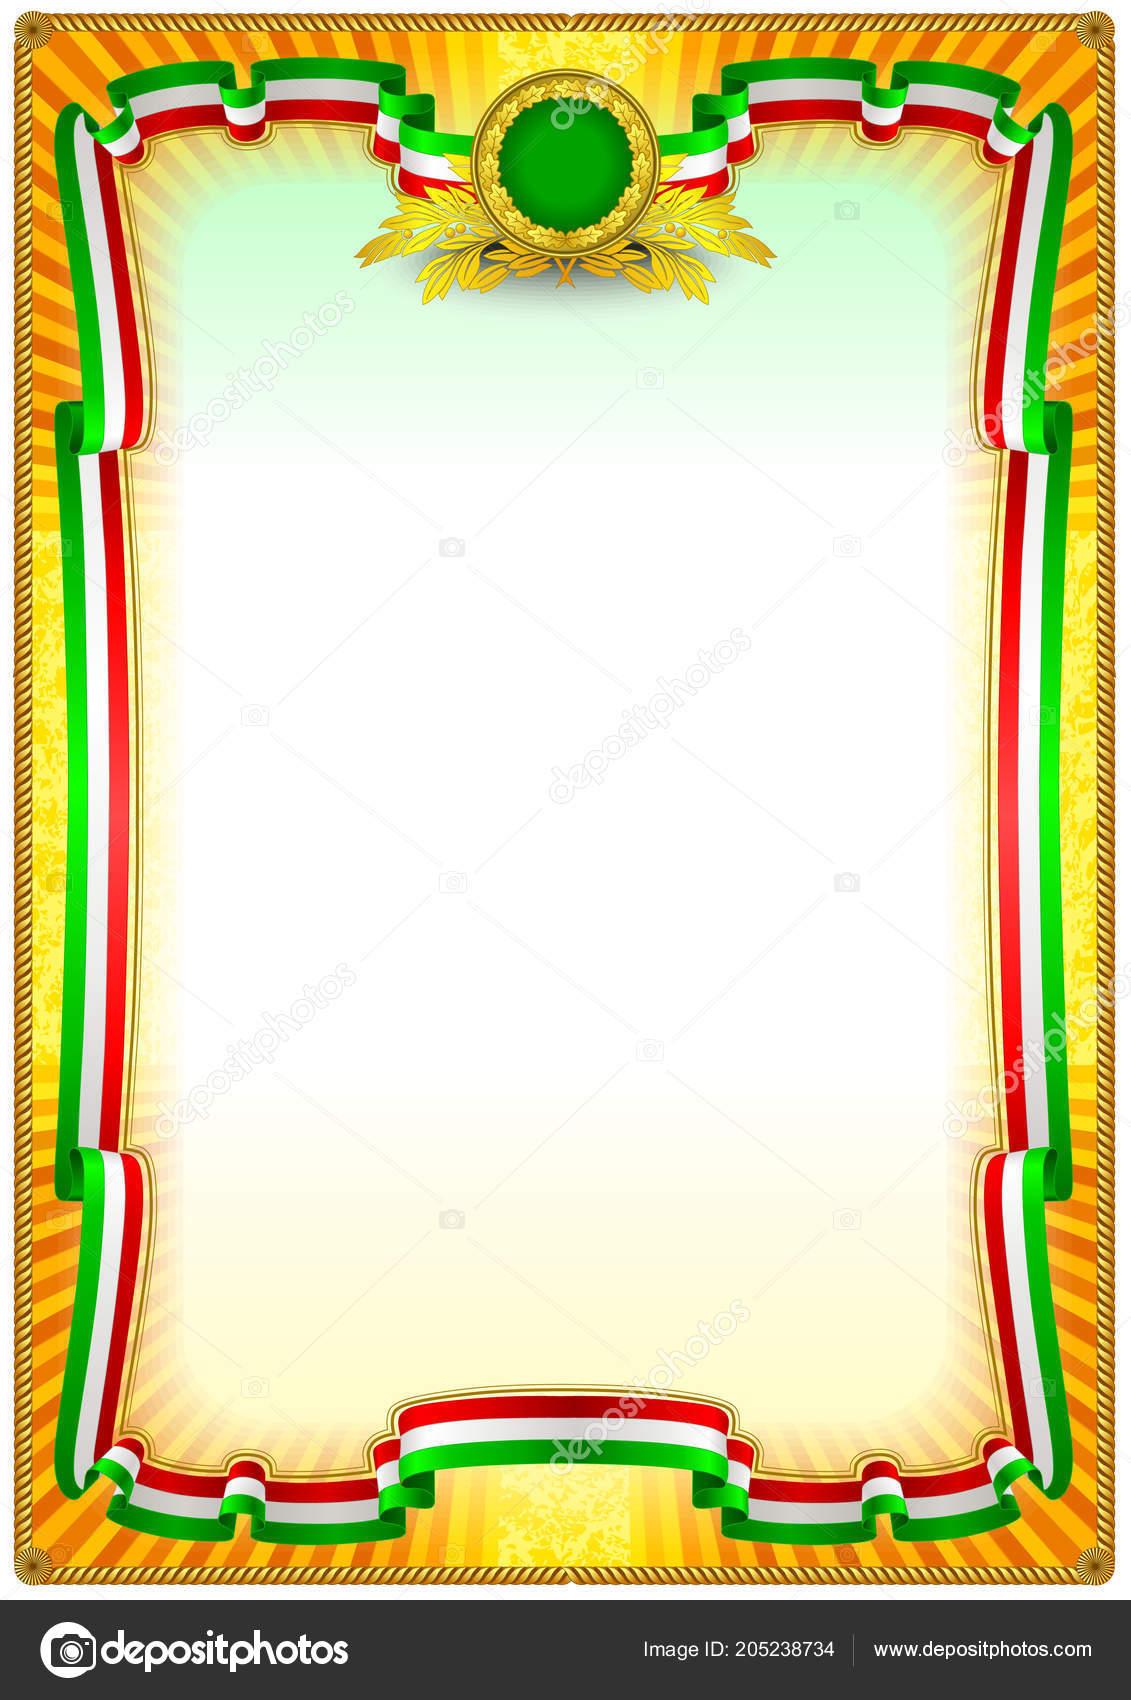 frame border template can use print design cetificate diplomas